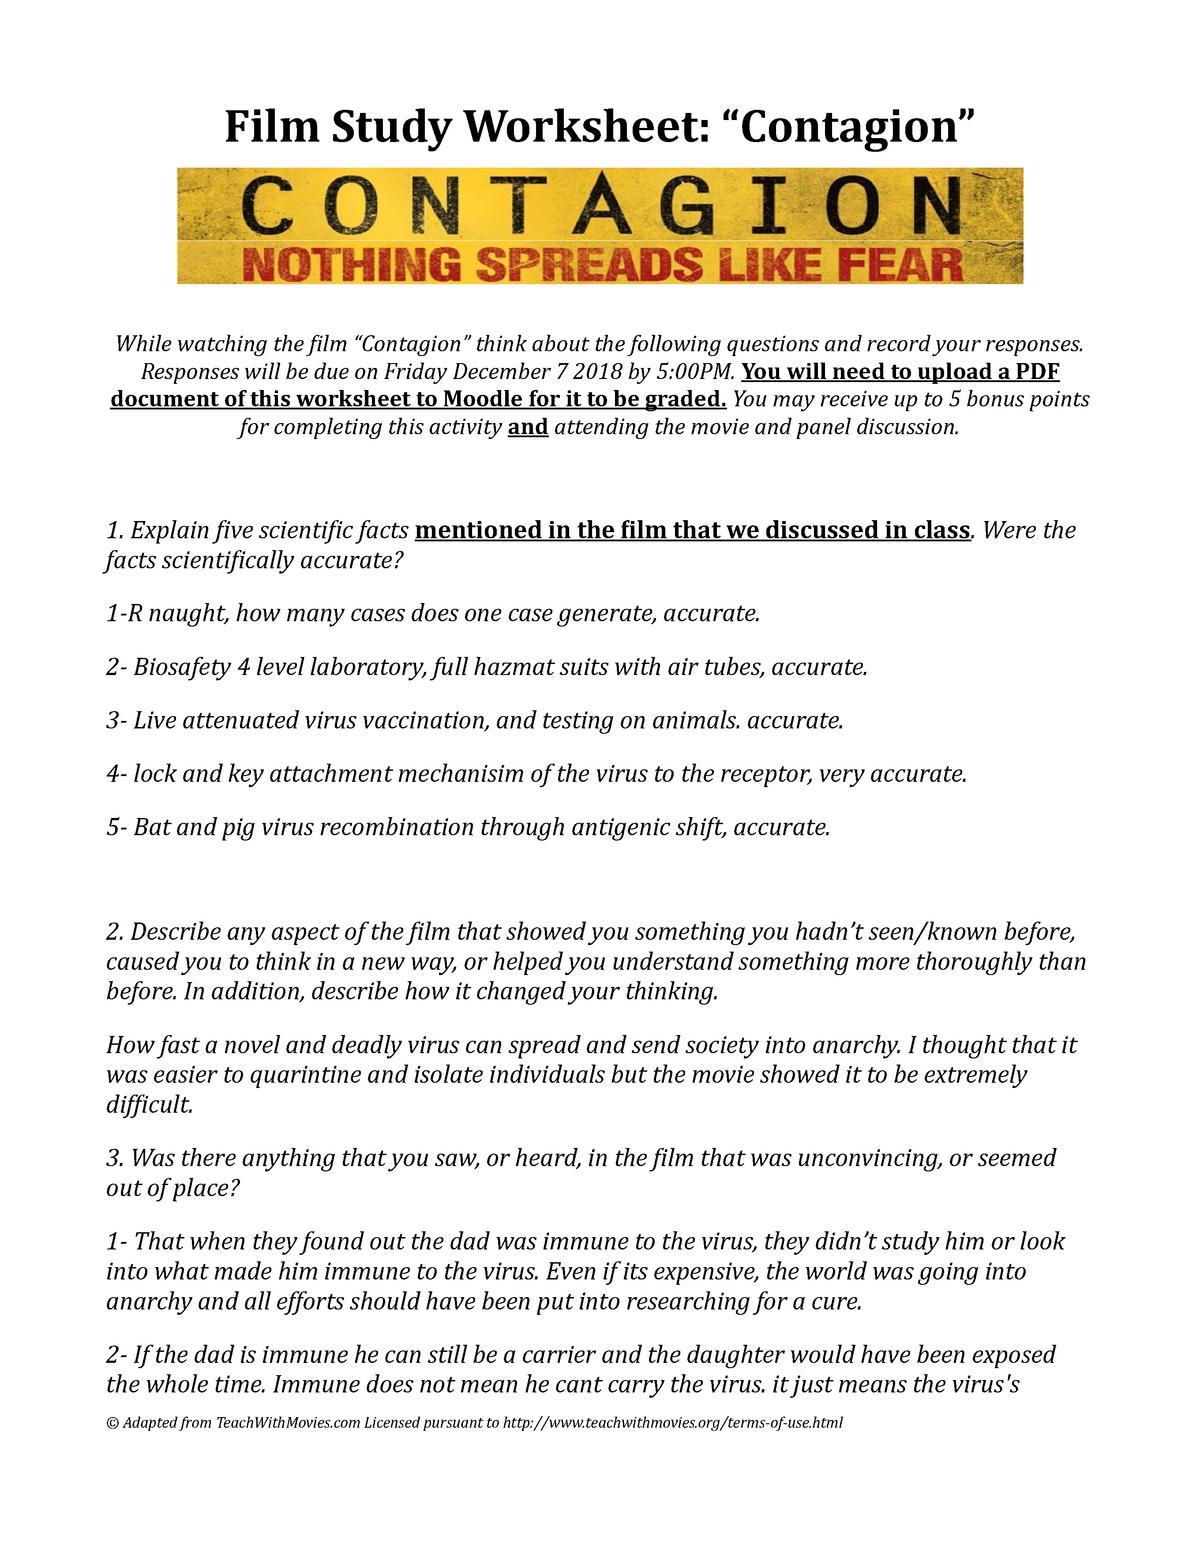 Contagion Movie Worksheet Fall 2018 Mb 351 Studocu